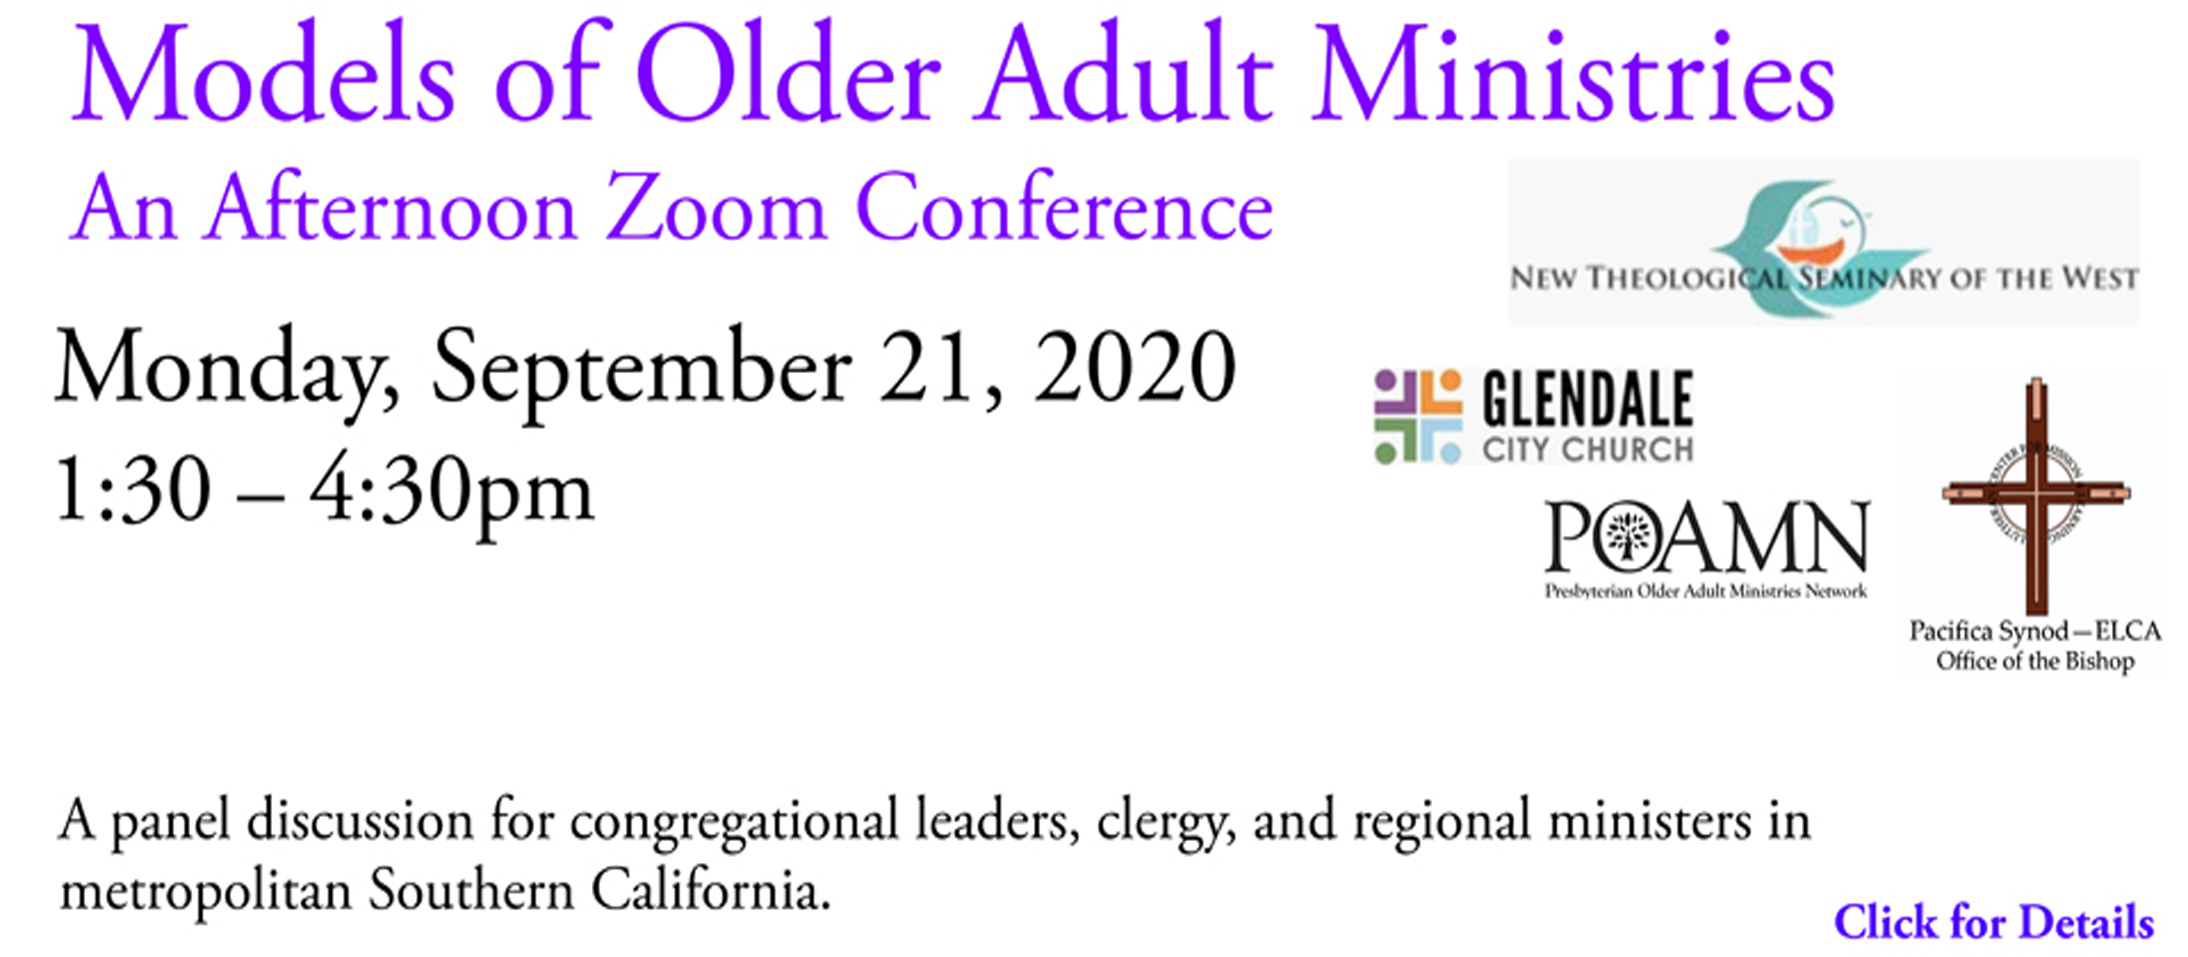 Permalink to:Spiritual Needs of Aging Congregants